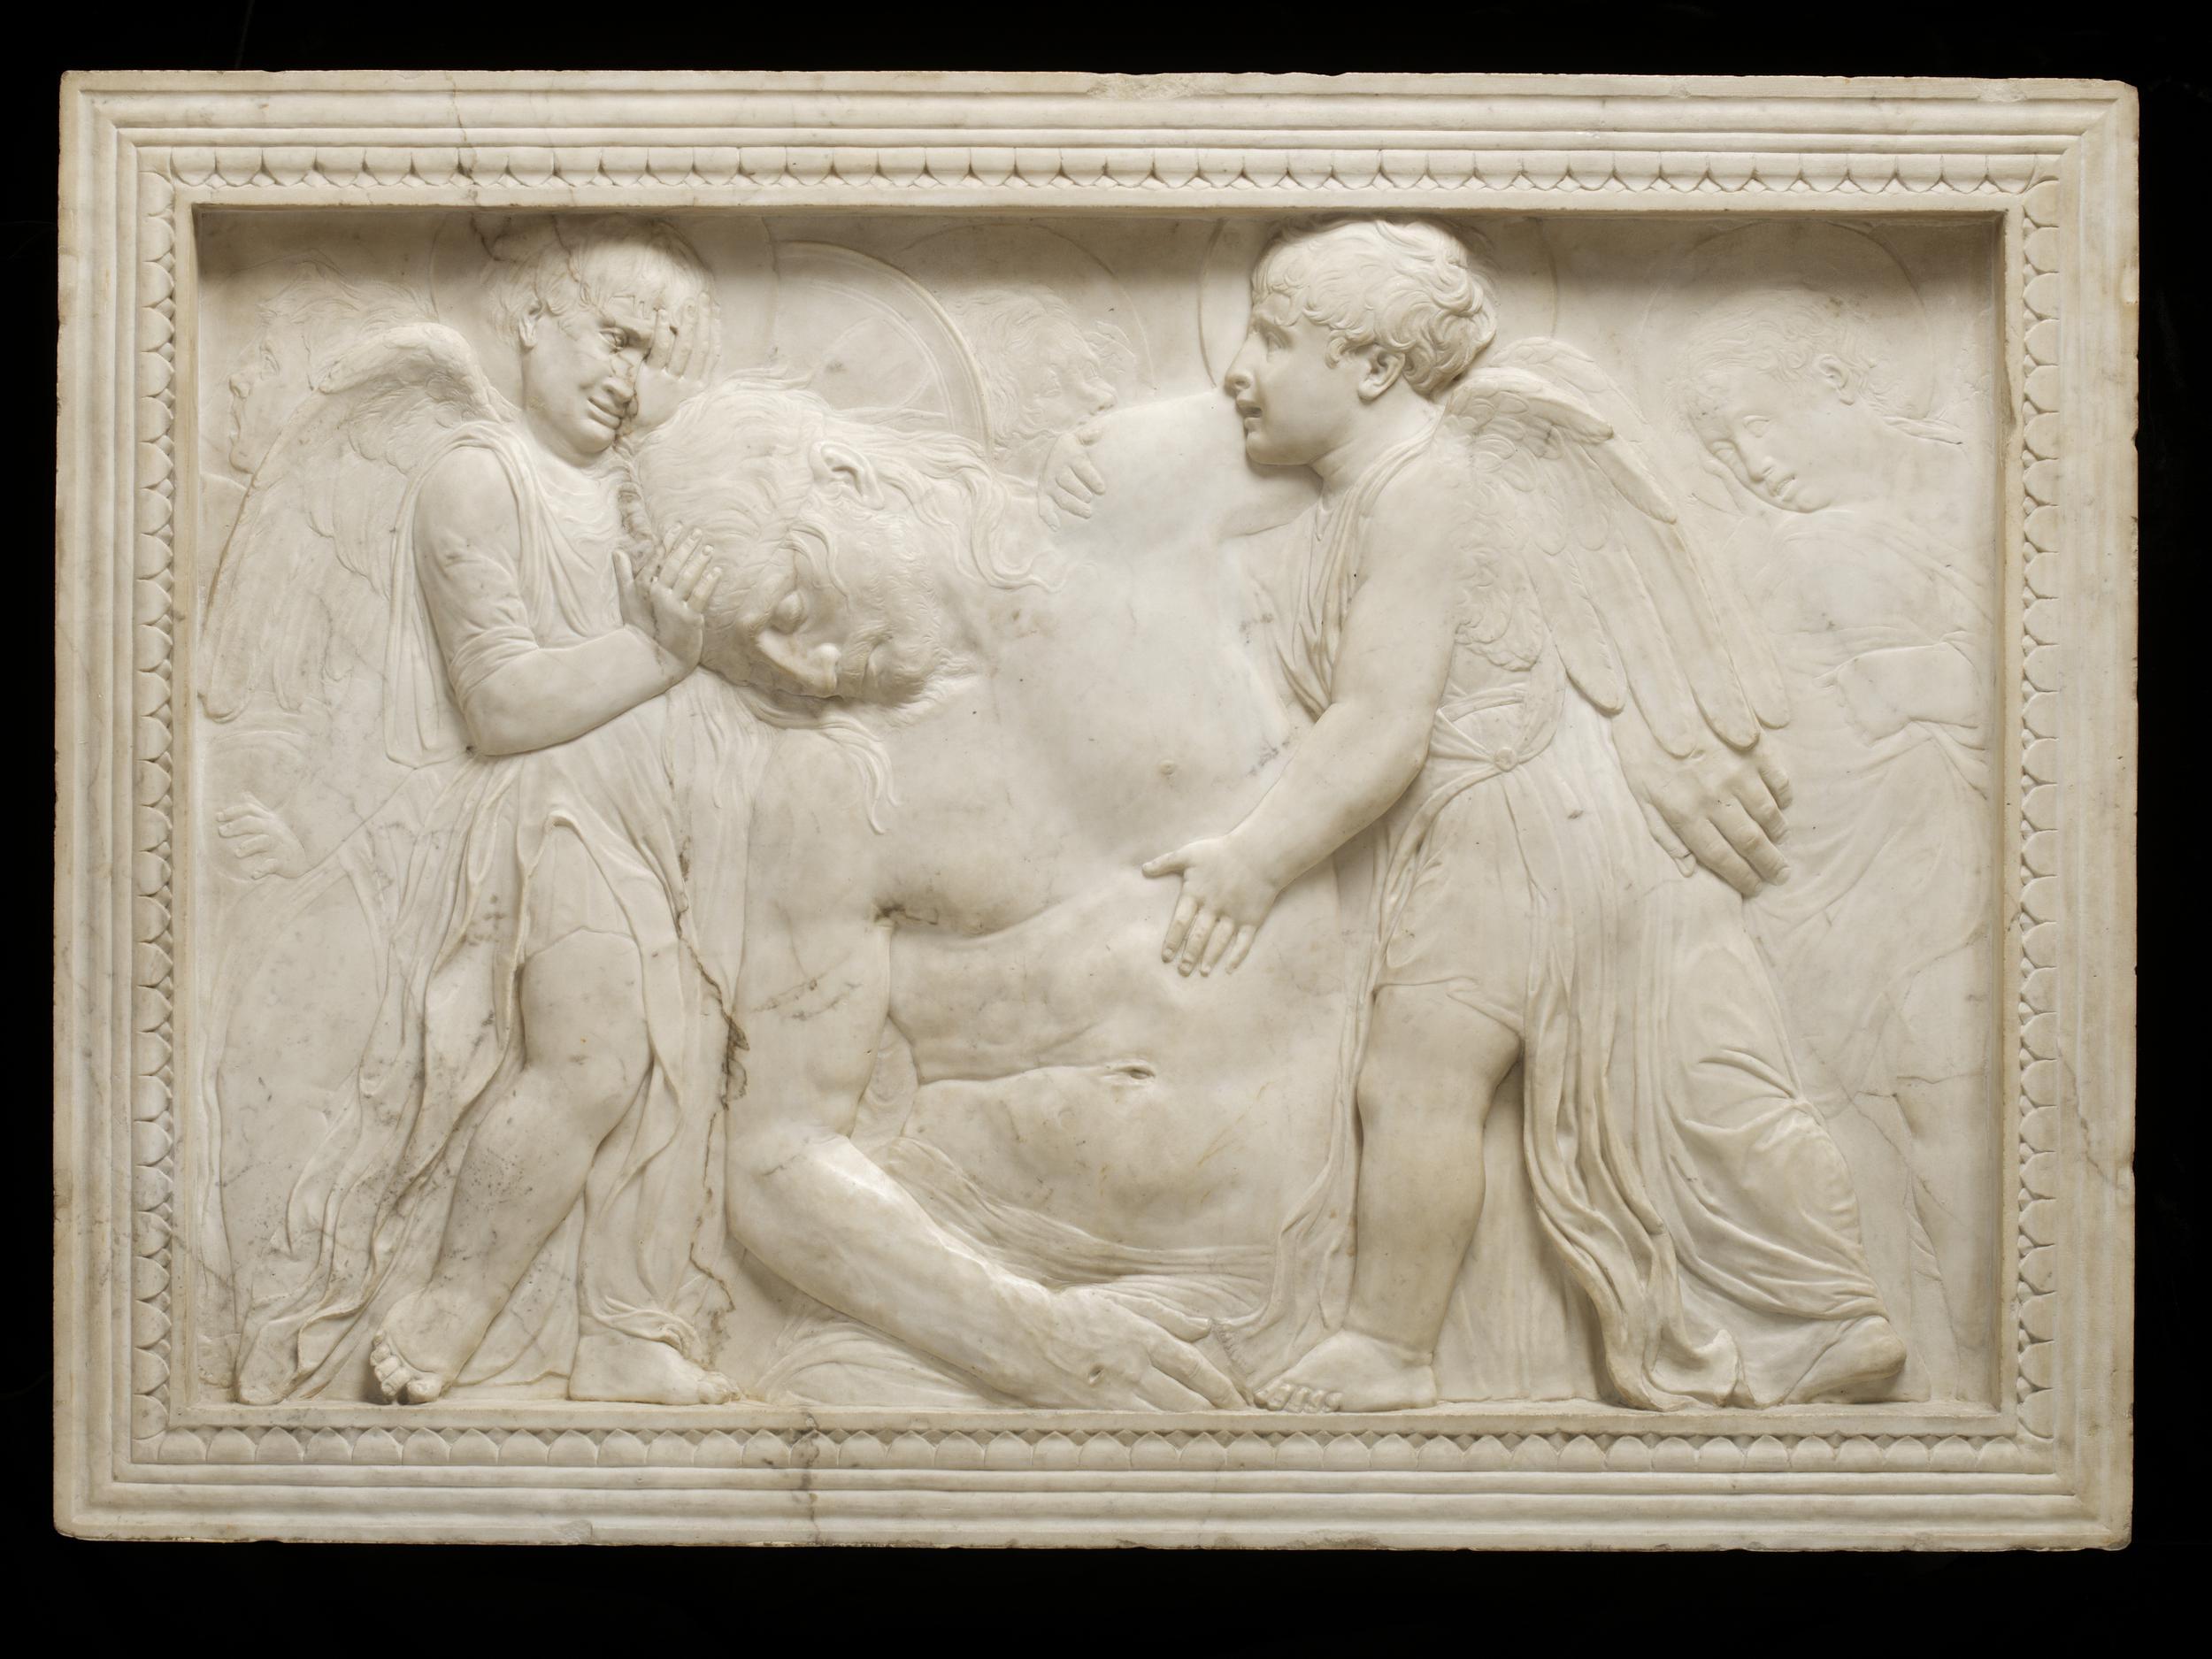 6 donatello dead christ tended by angels.jpg